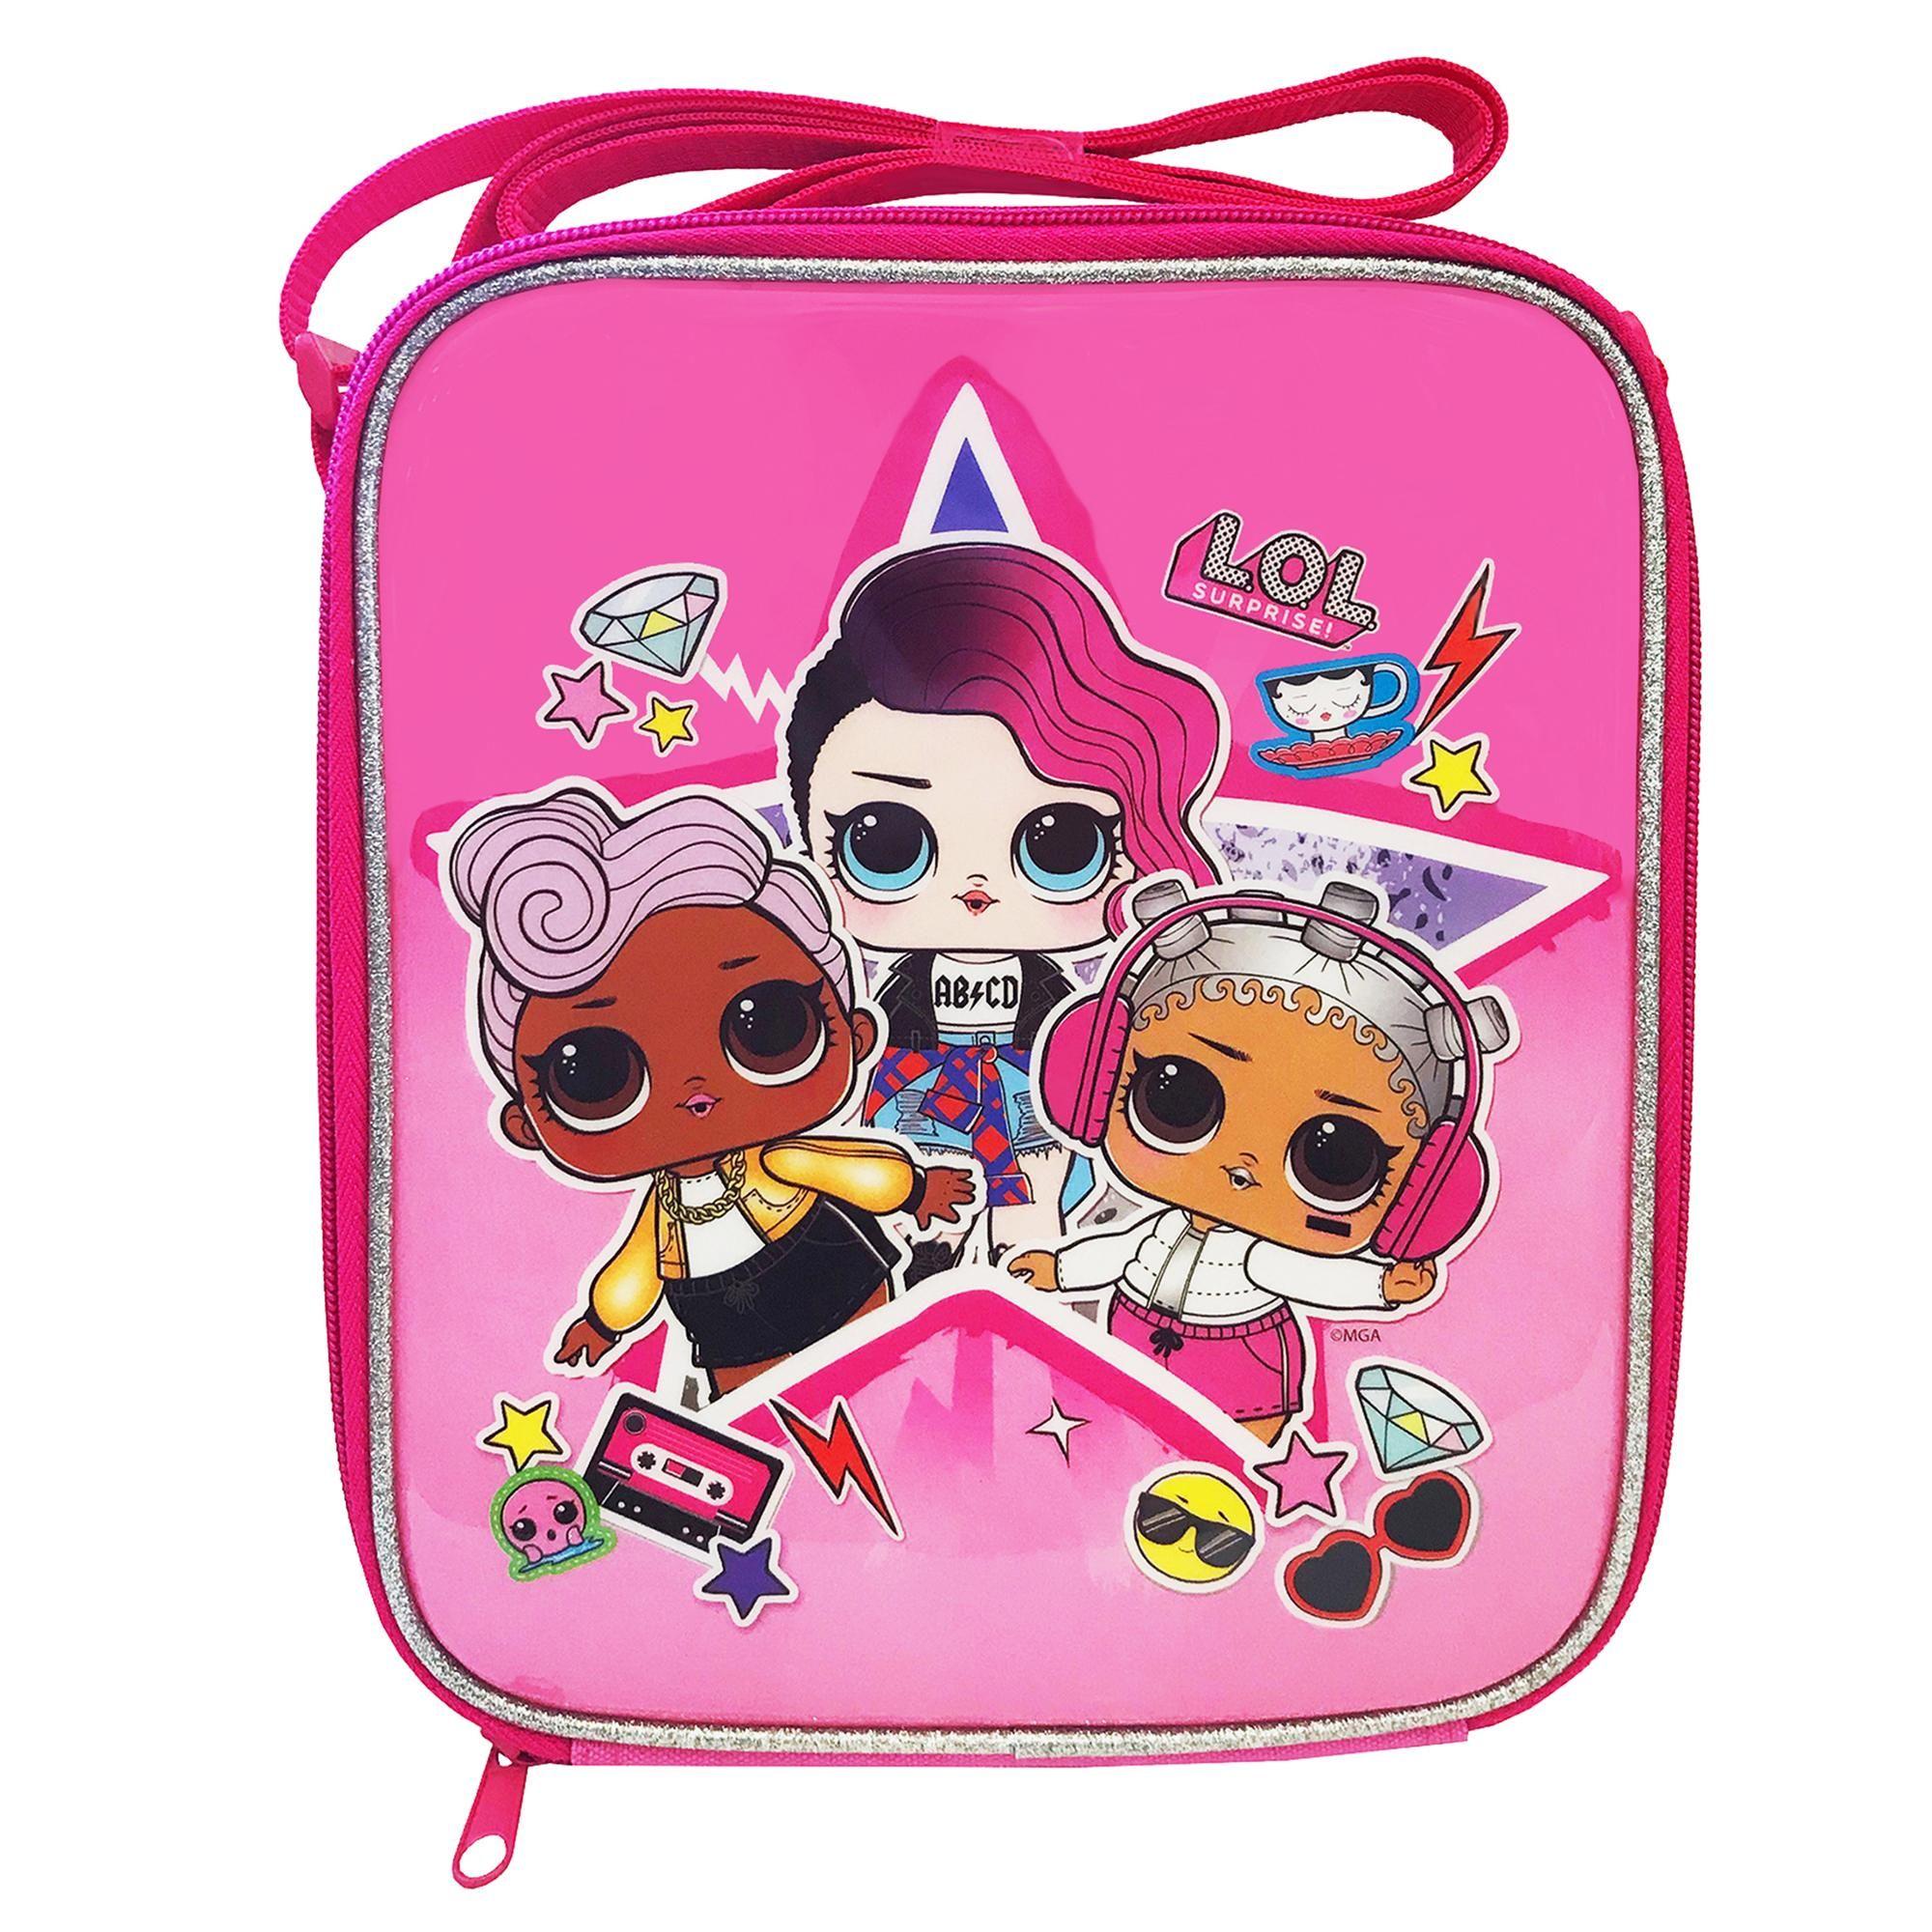 Marvel Avengers  Lunch Bag Set 3 Piece Drinks Bottle Box Bag School Travel Zip